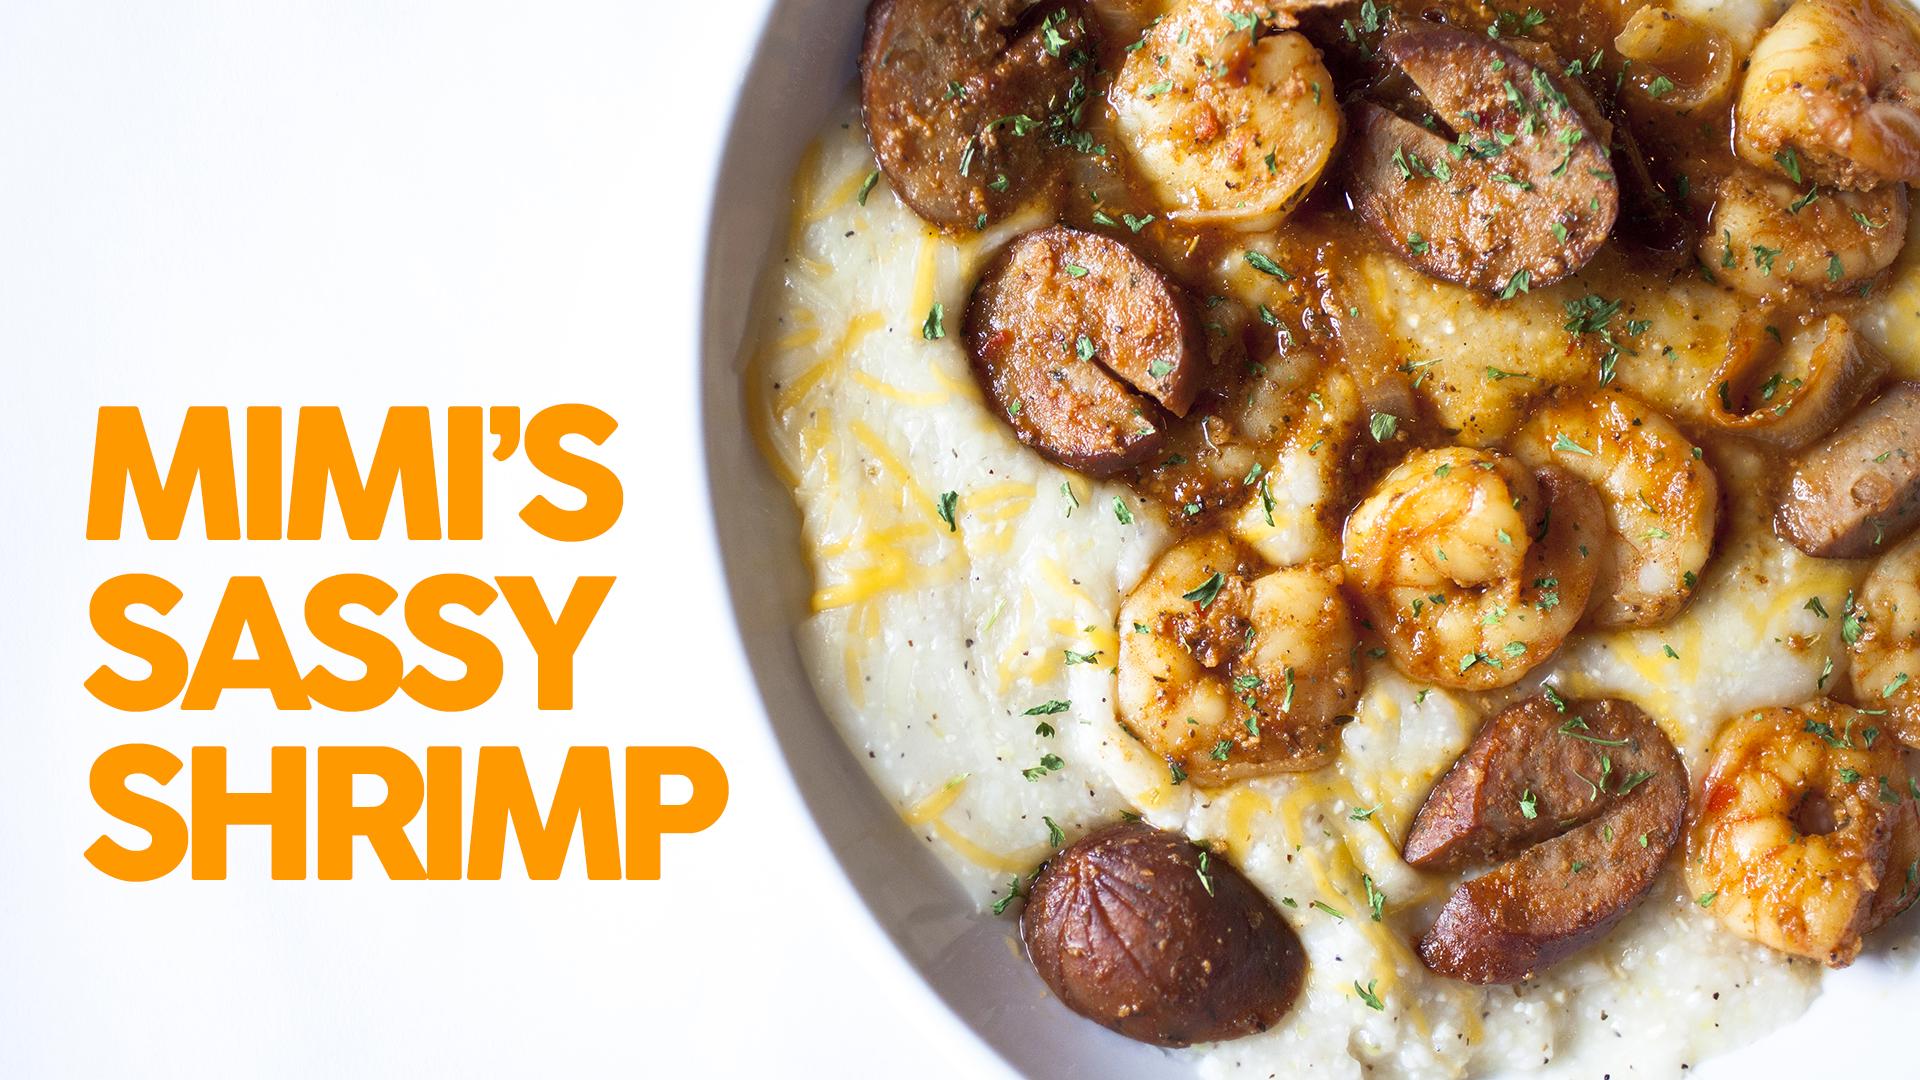 Mimi's Sassy Shrimp